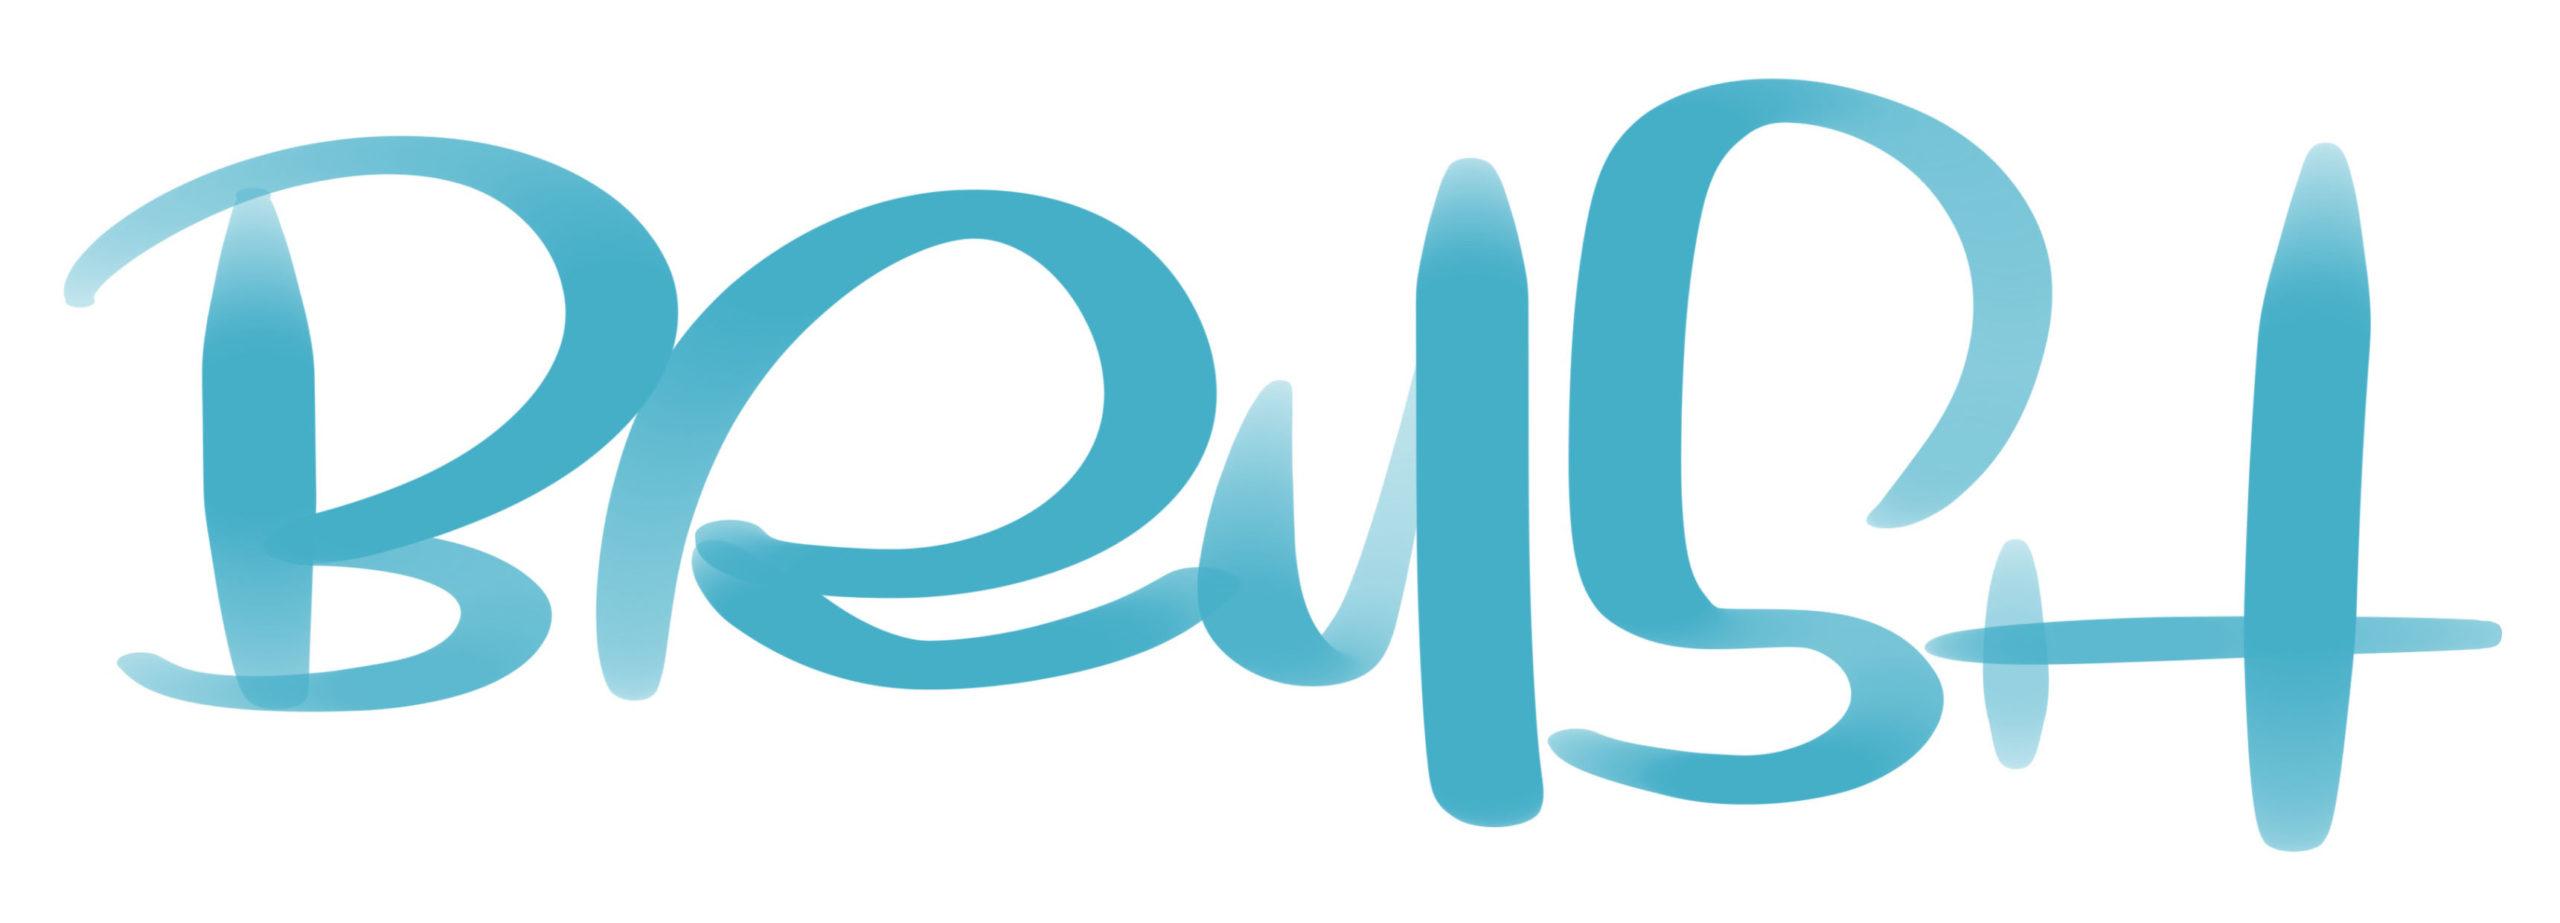 Modernes Brushlettering Alphabet als Wort BRUSH mit Brushpen bzw. Wassertankpinsel gelettert